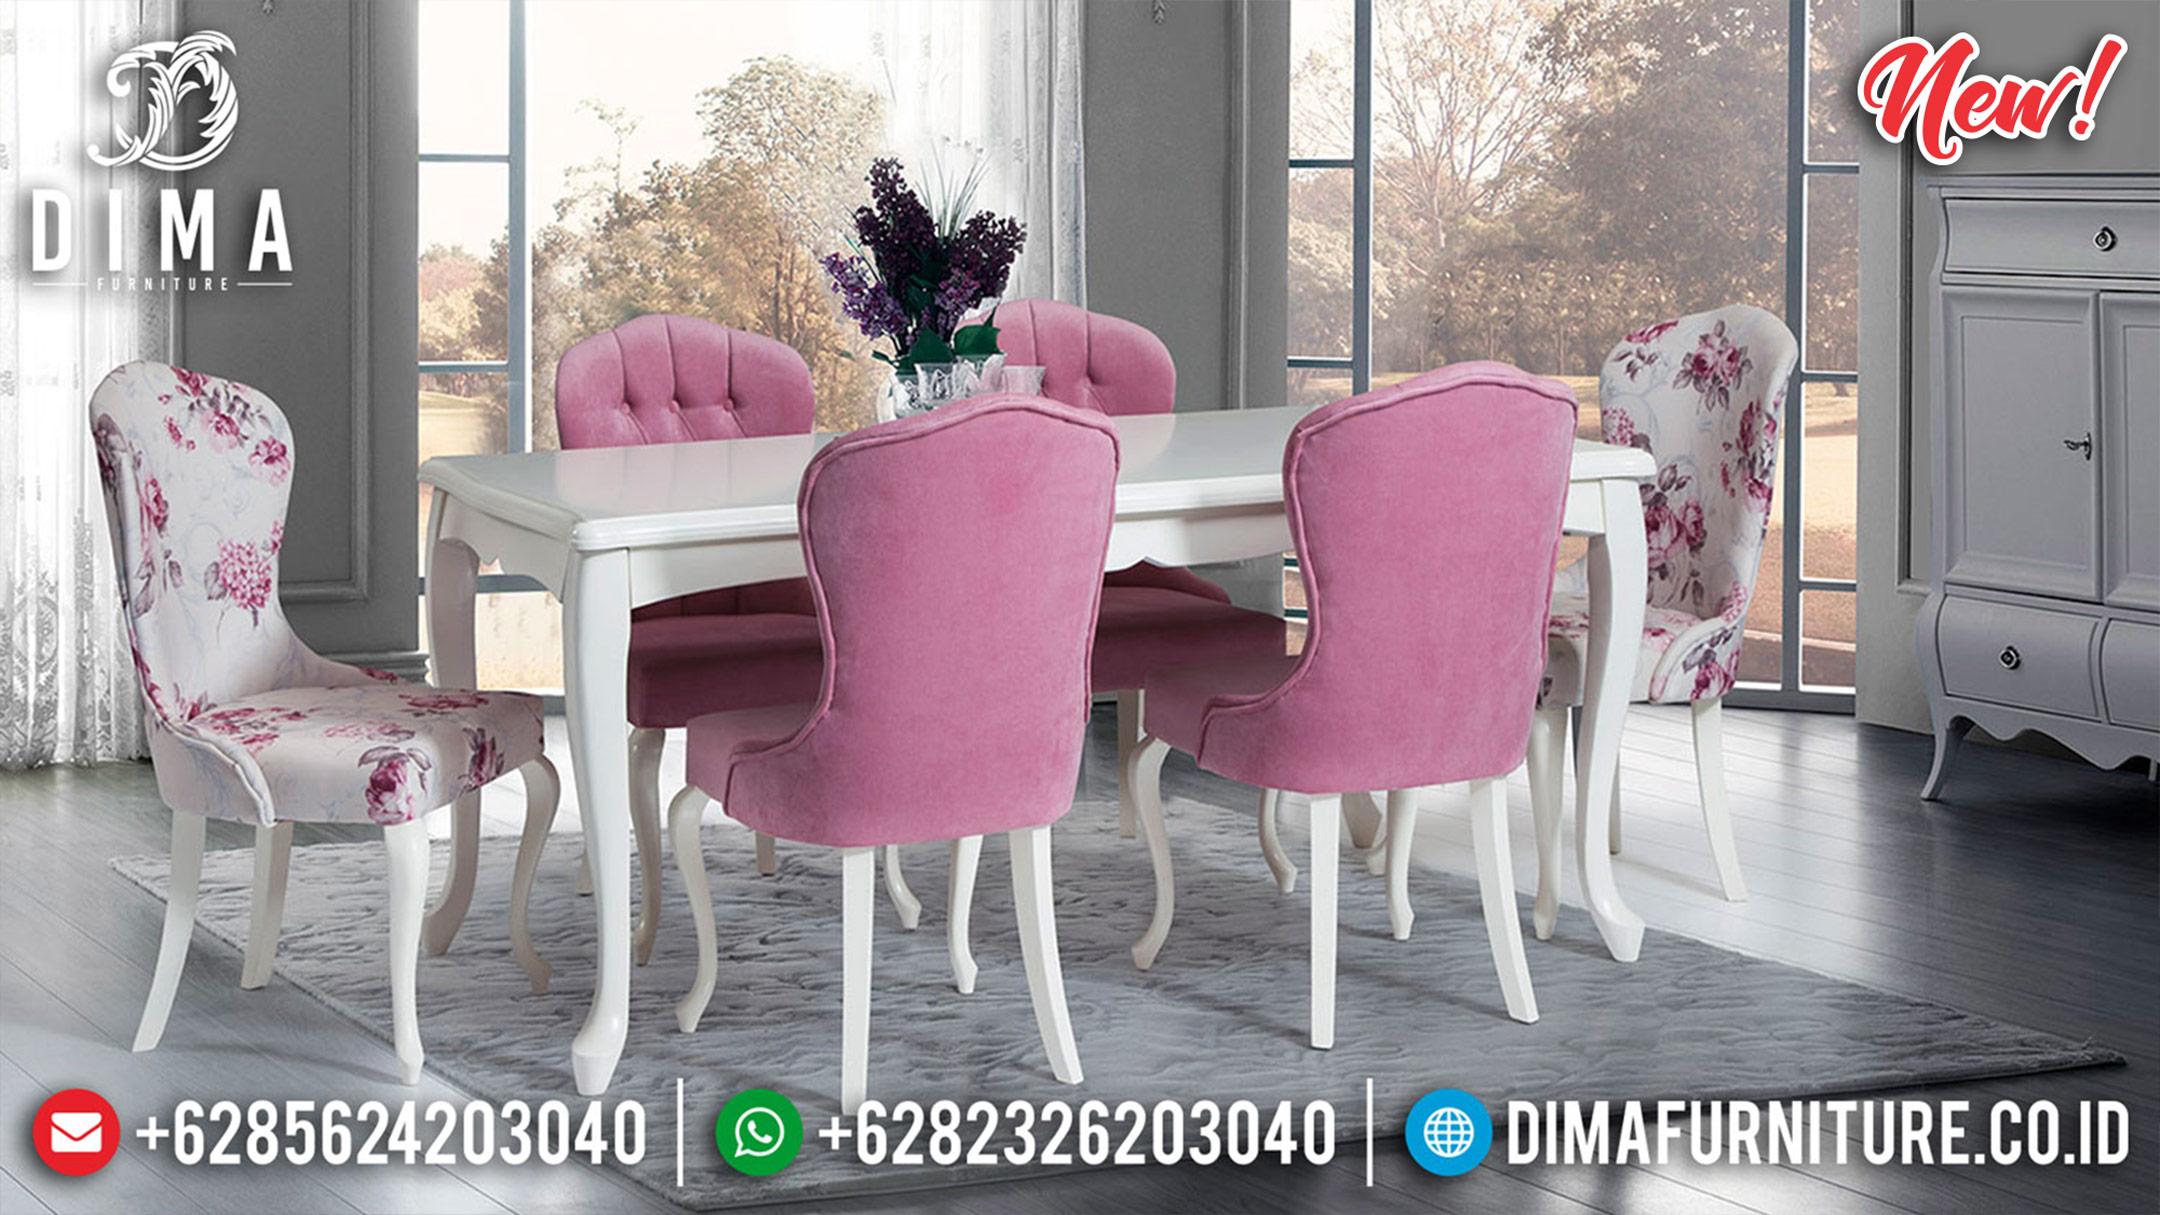 Harga Meja Makan Minimalis Jepara Luxury Shabby Wonderful Furniture ST-1169